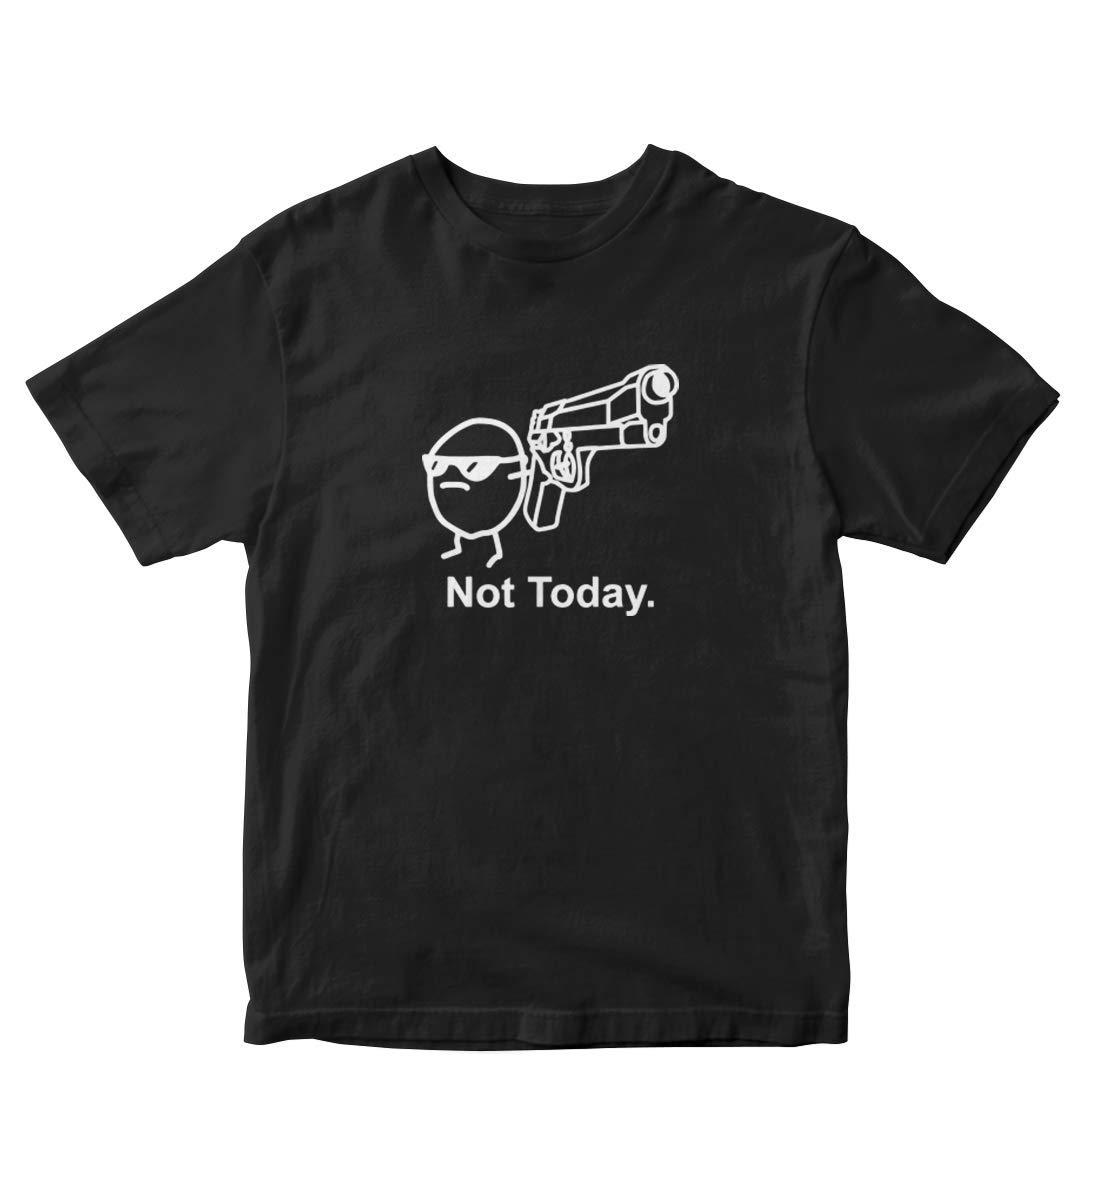 Not Today Potato Asdfmovie Black Shirt S M117